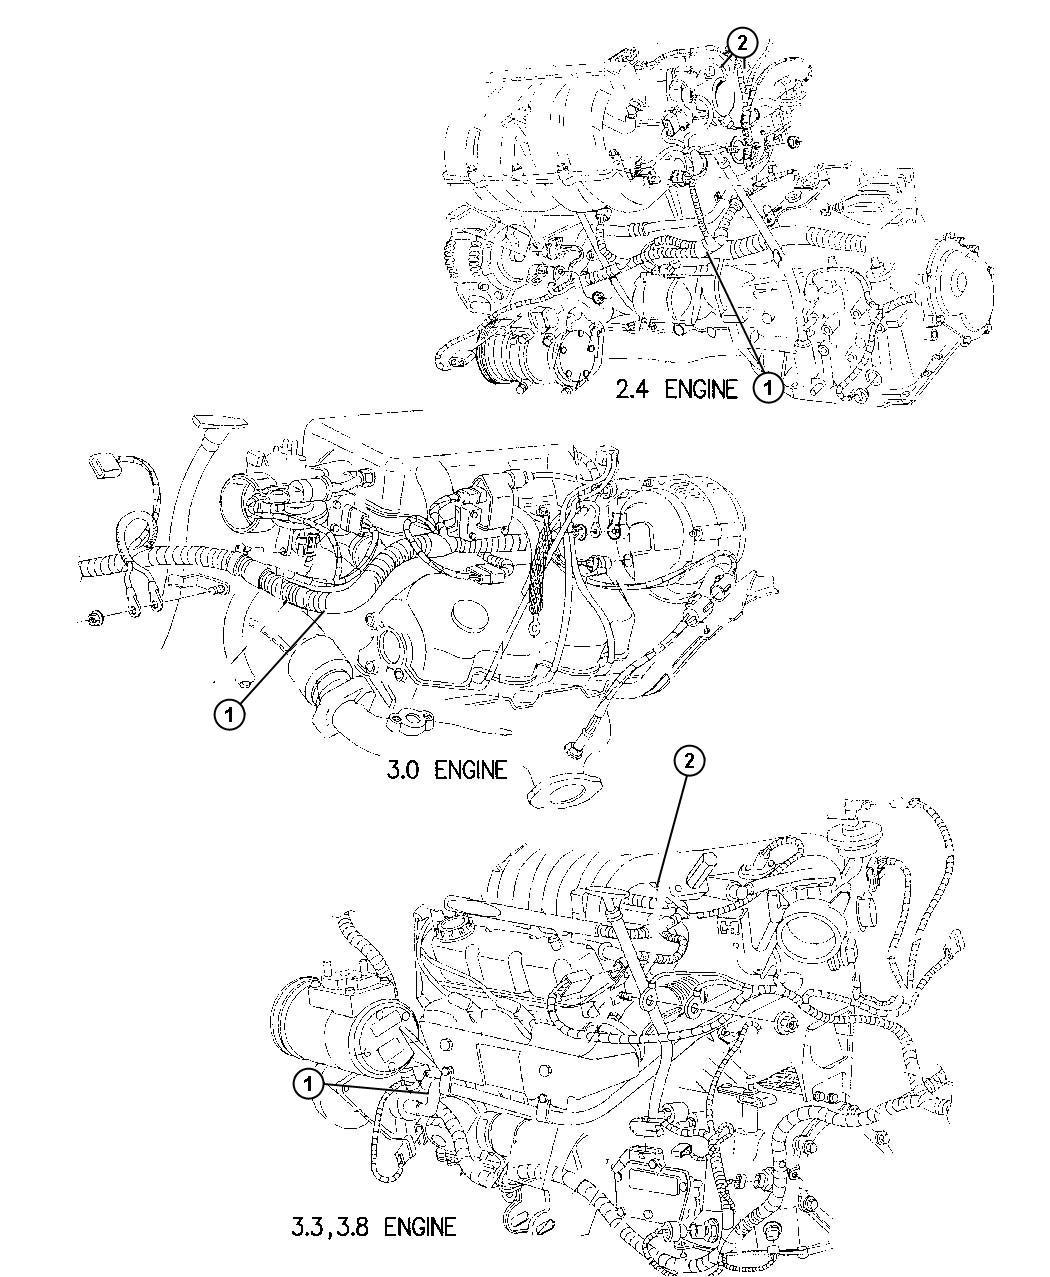 1997 Dodge Grand Caravan Wiring. Engine. Related, mopar